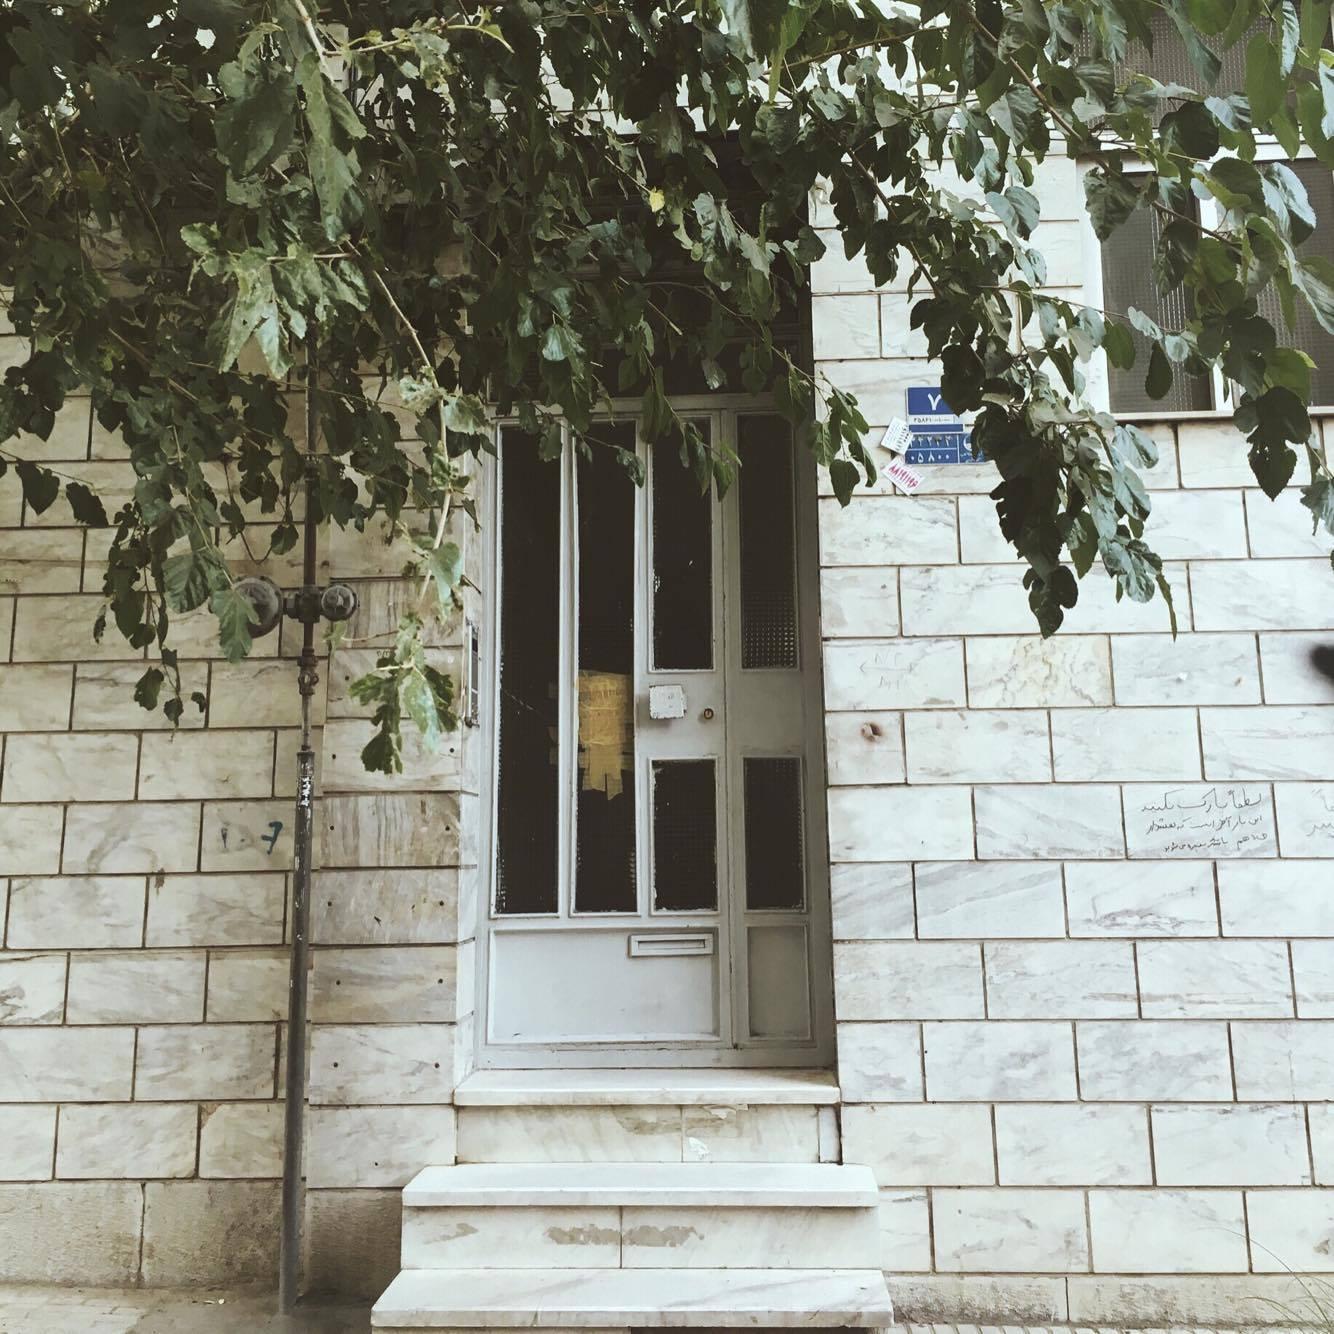 My childhood home in Tehran, Iran